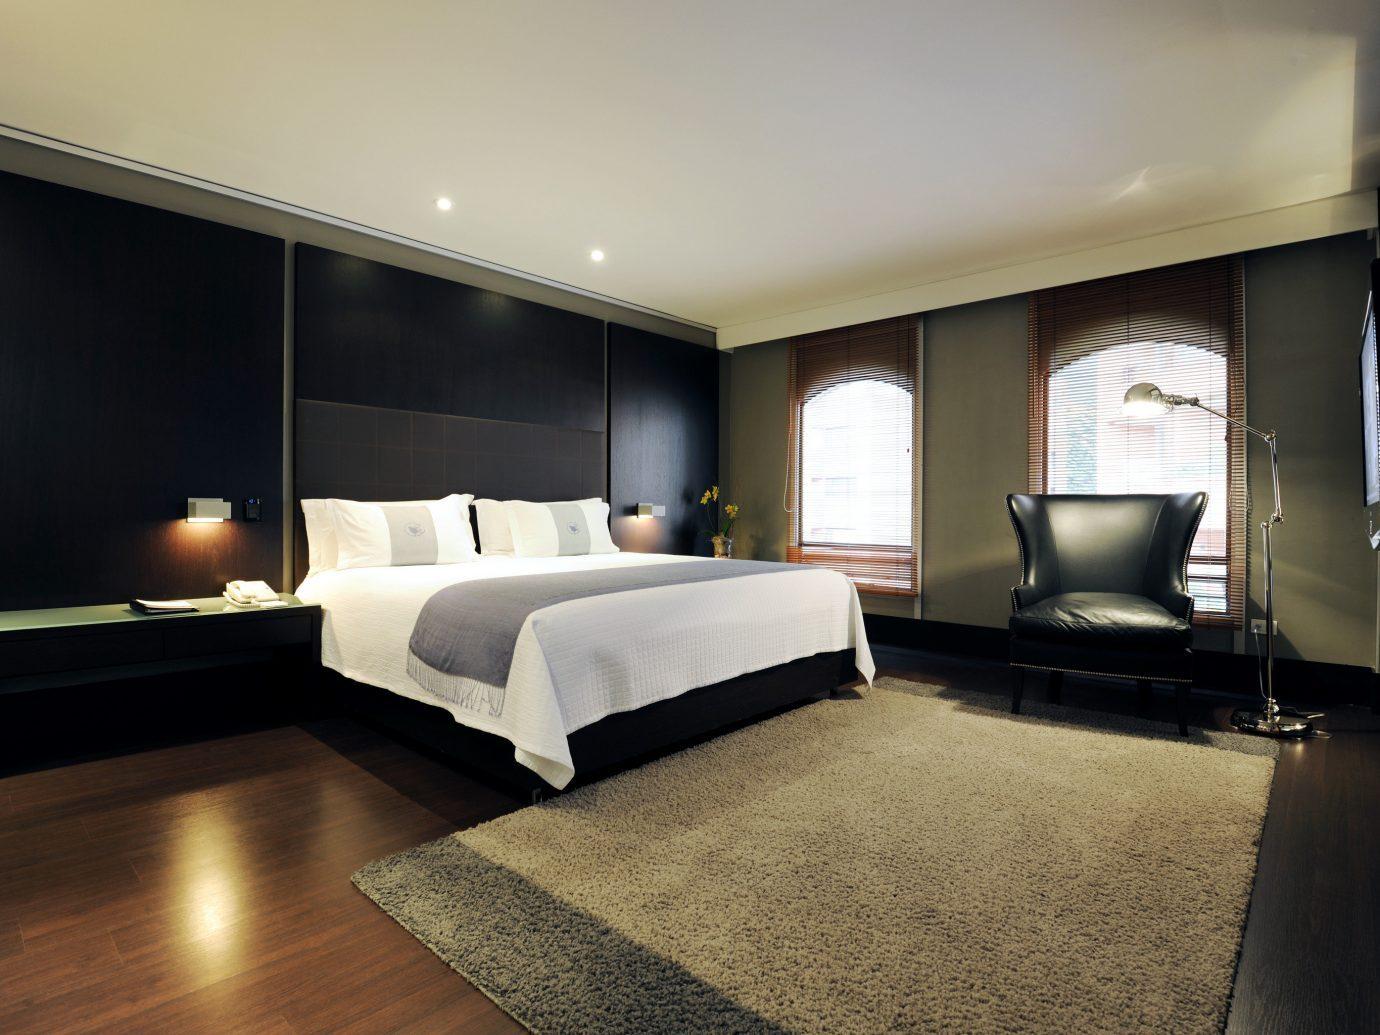 Bedroom at the Four Seasons Hotel Bogota